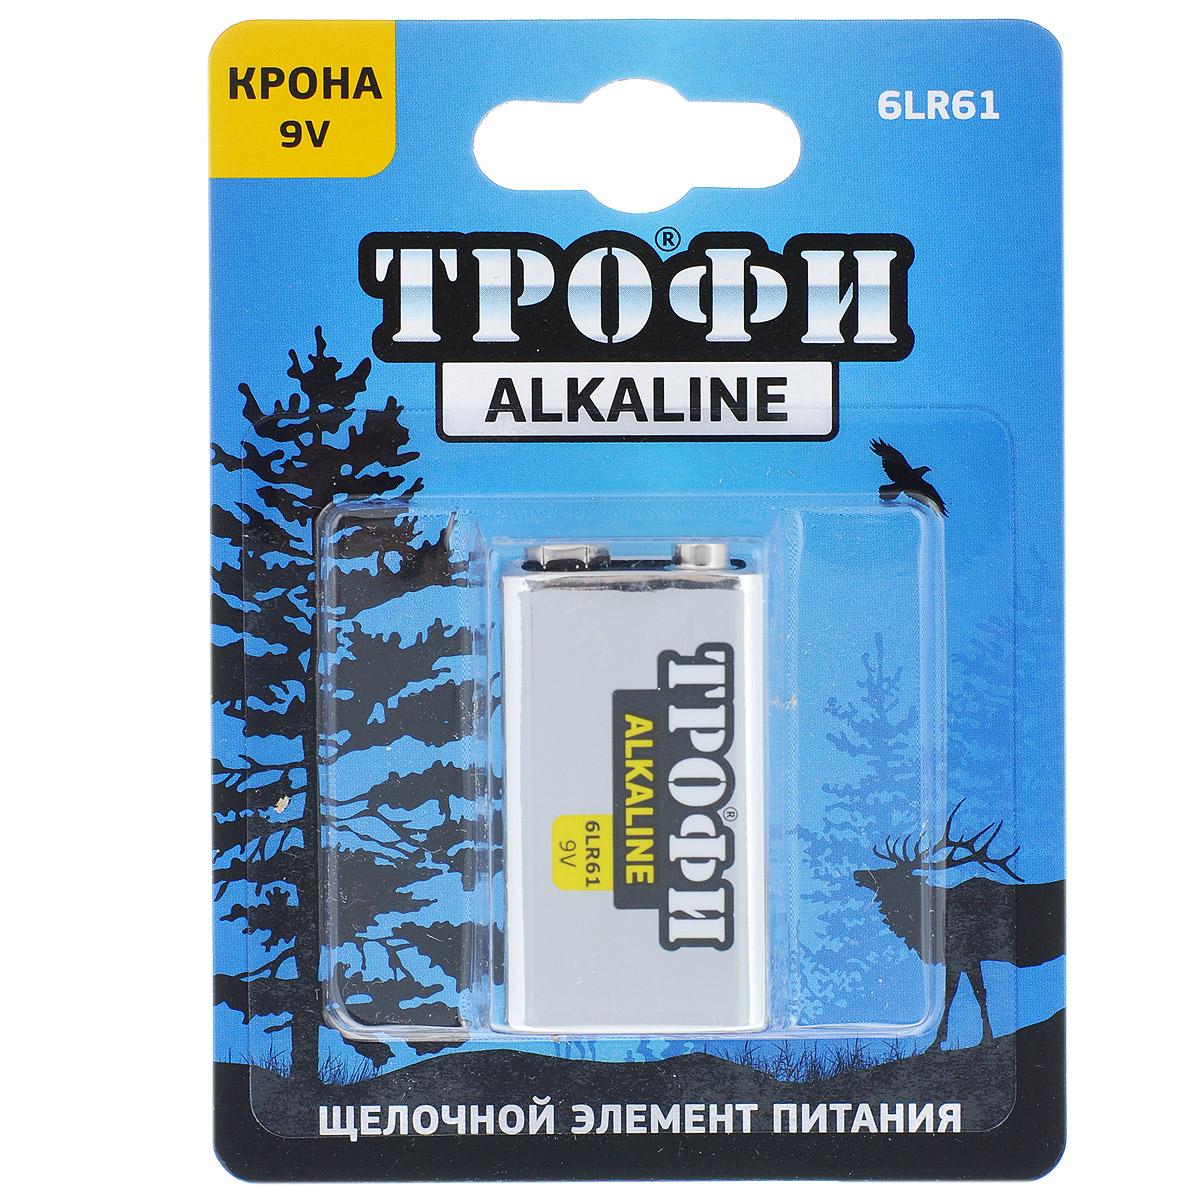 Батарейка алкалиновая Трофи, тип крона 6LR61 (1BL), 9В